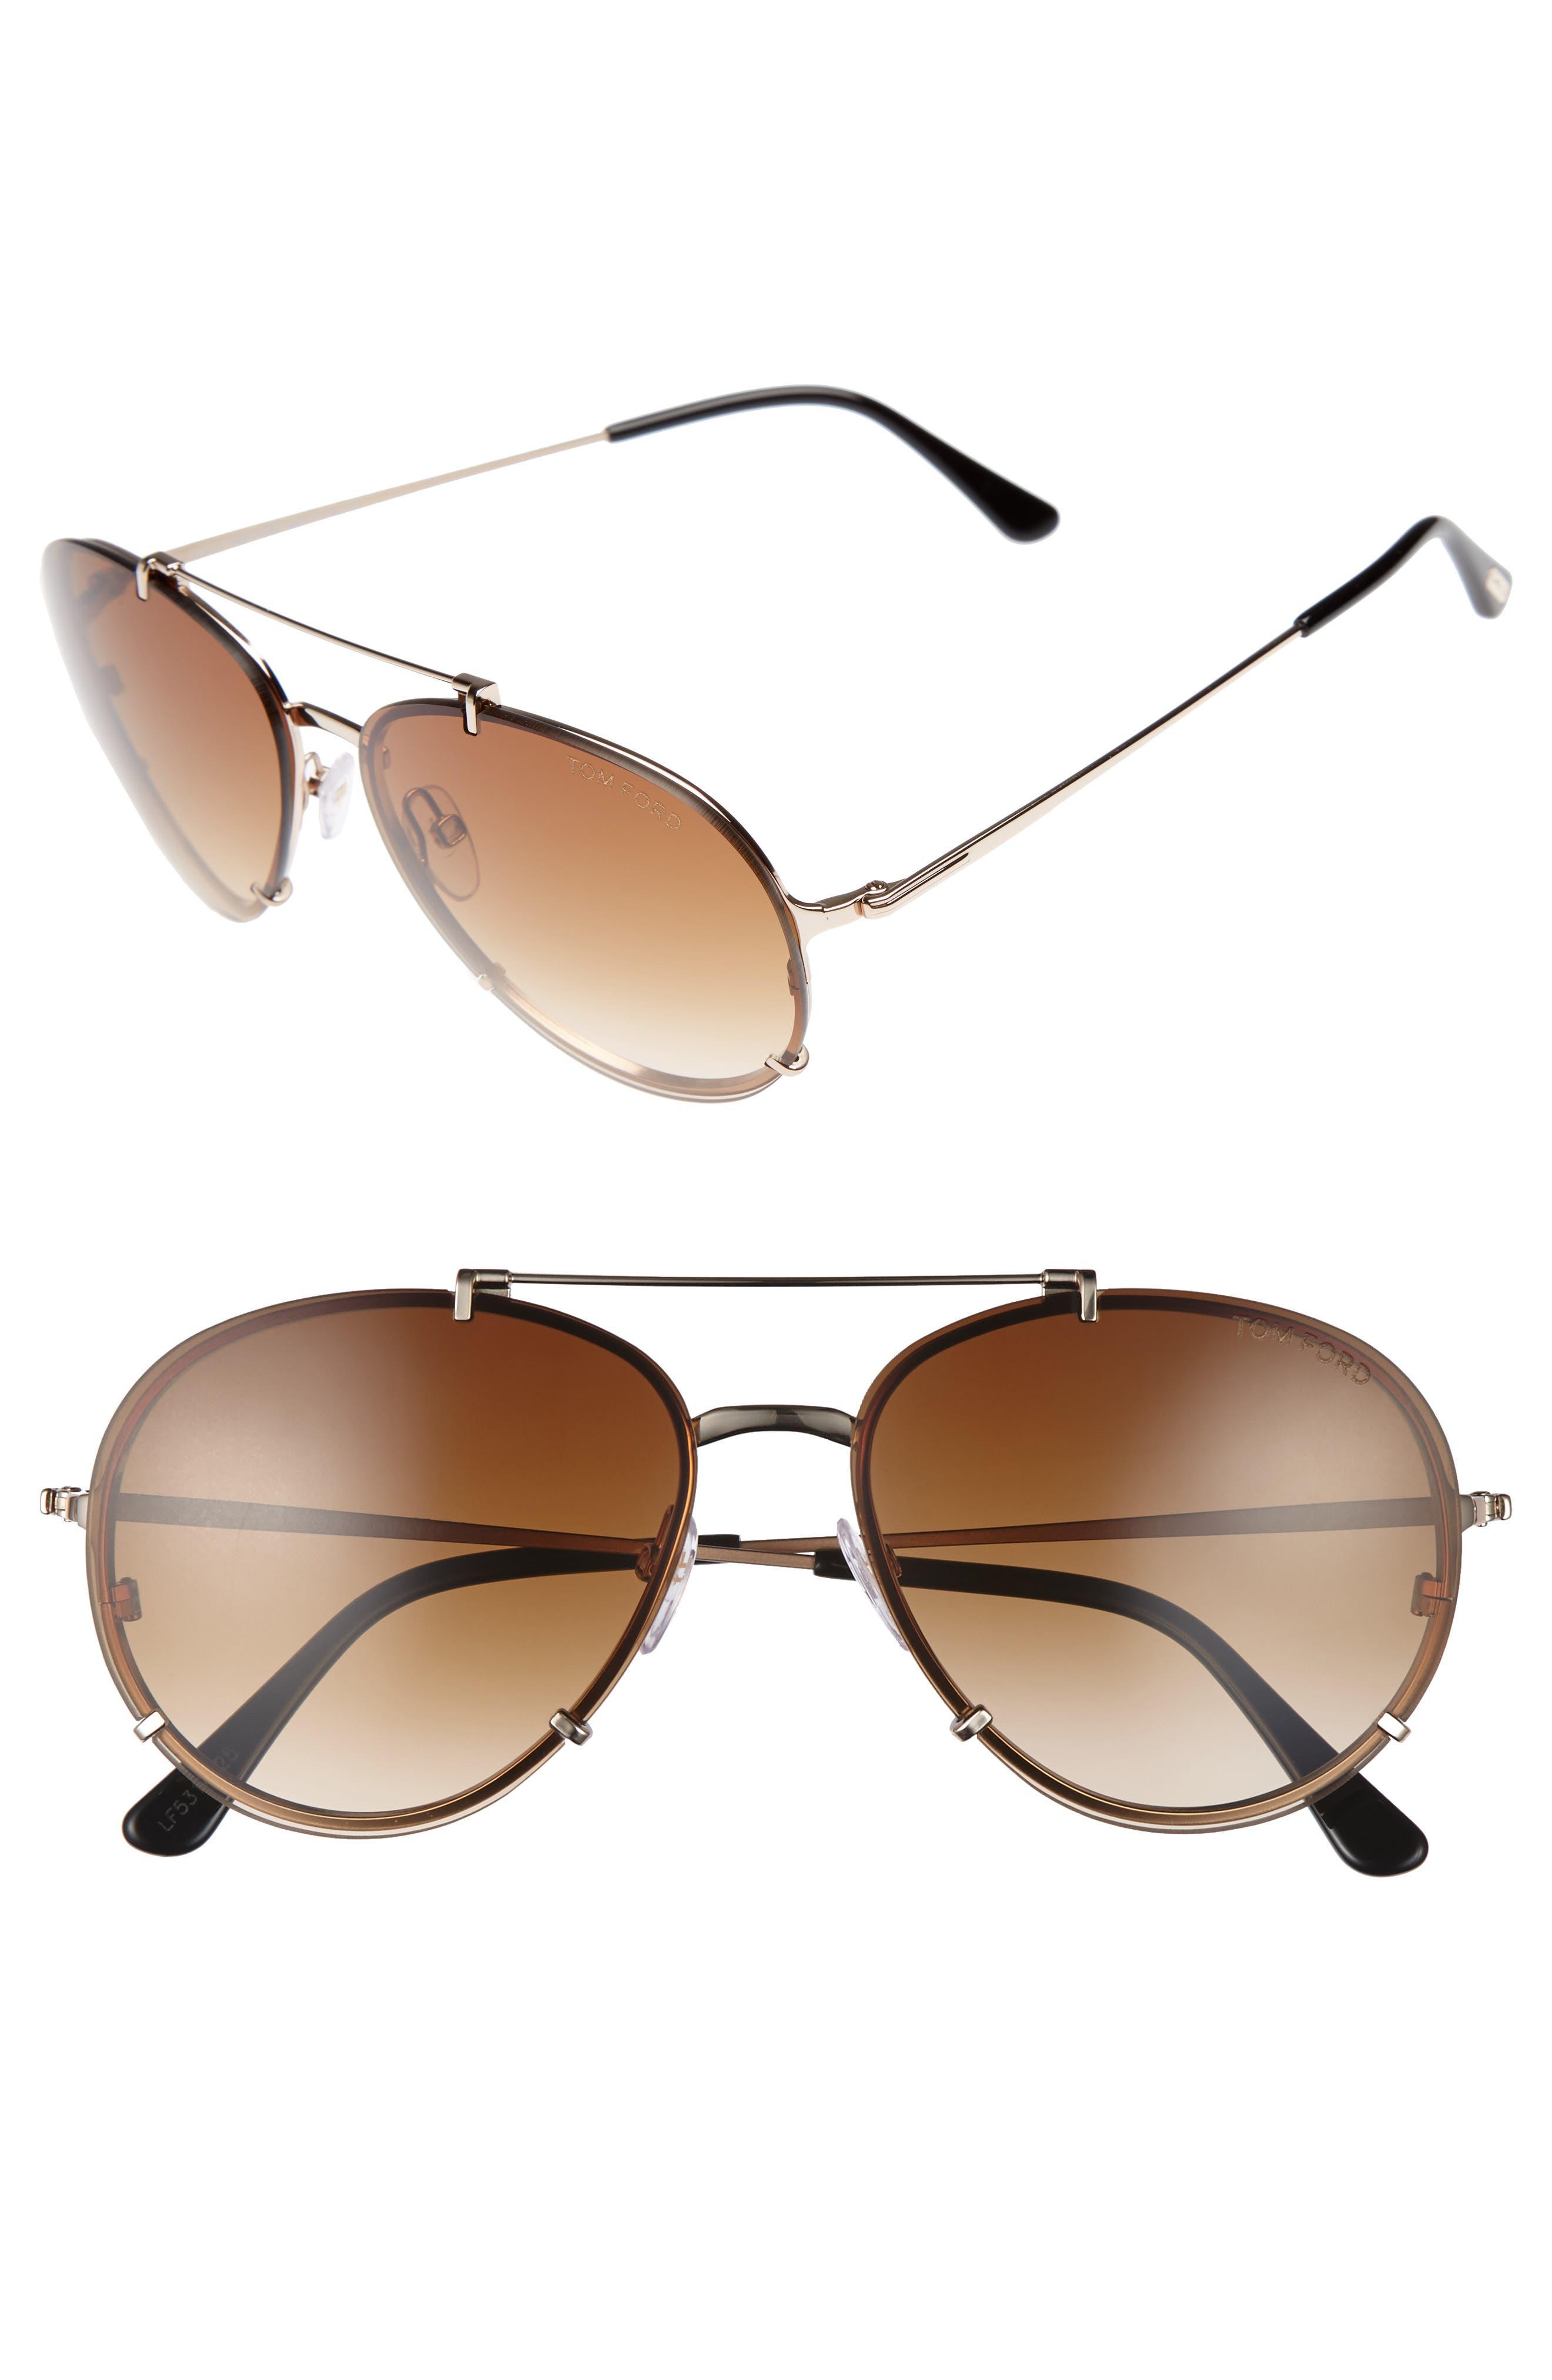 Dickon 59mm Aviator Sunglasses,                         Main,                         color, Shiny Rose Gold/ Brown